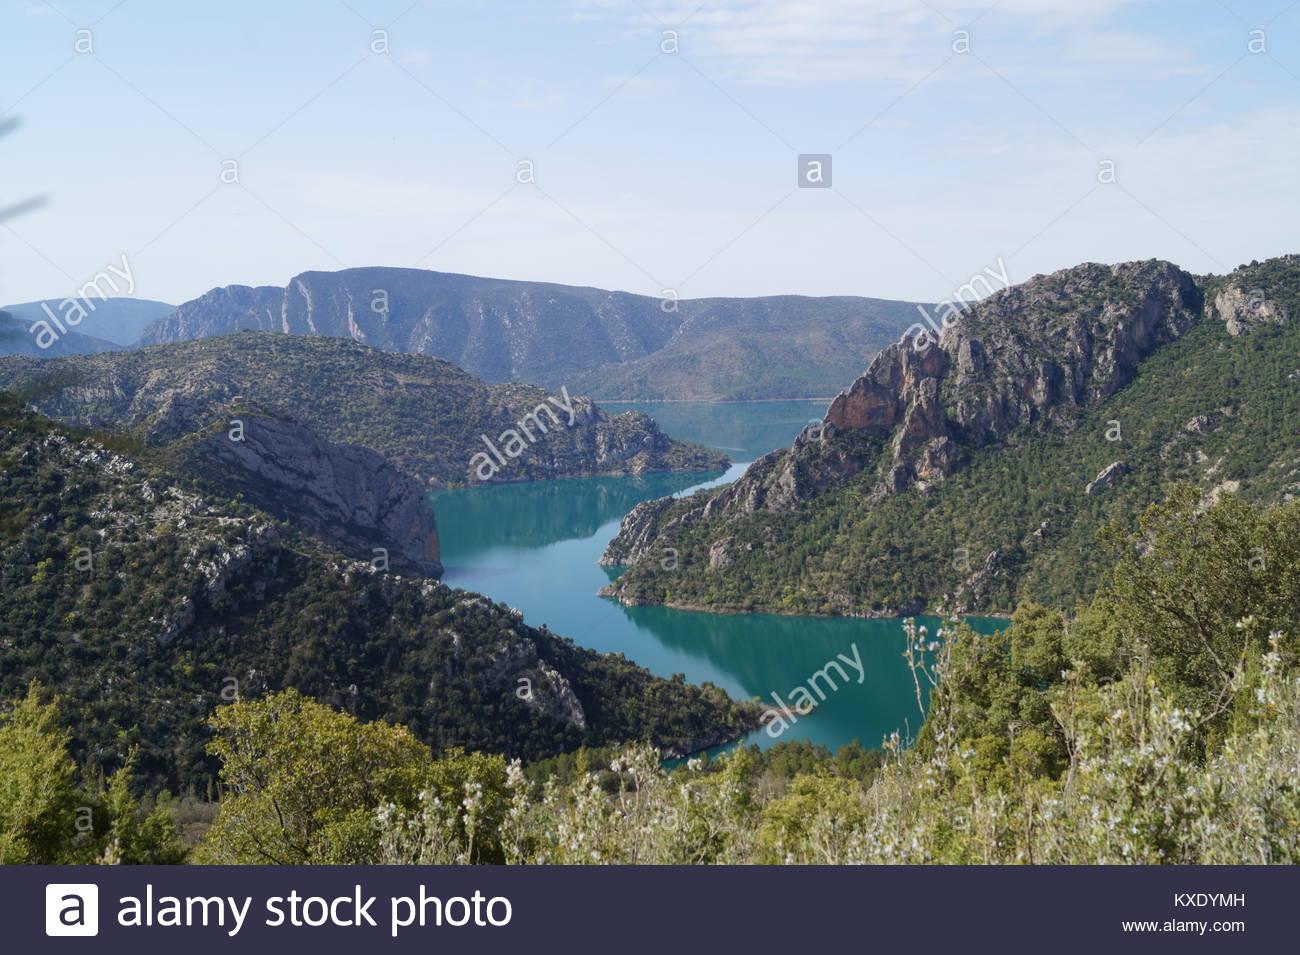 Desfiladero de Monrrebey - Congosto de Mont Rebei - Stock Image